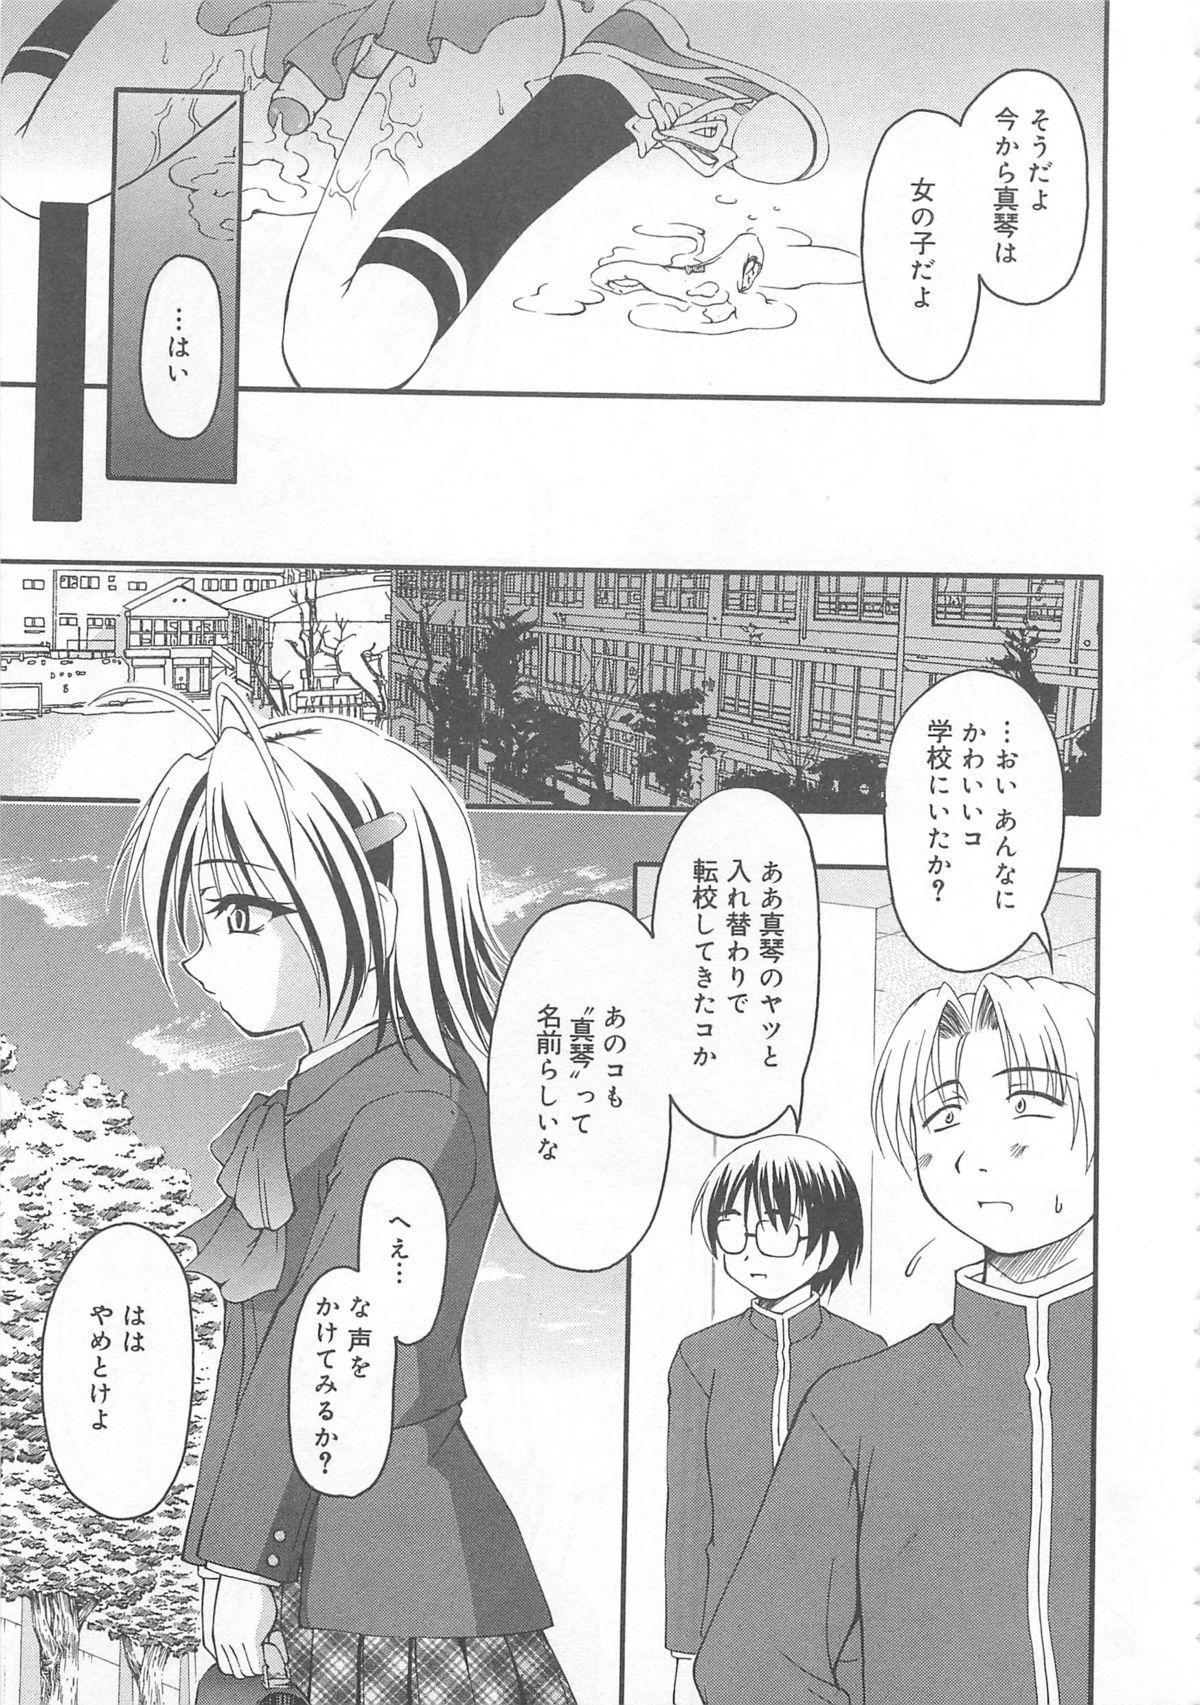 Otokonoko HEAVEN Vol. 02 Dokidoki Chikan Taiken 117